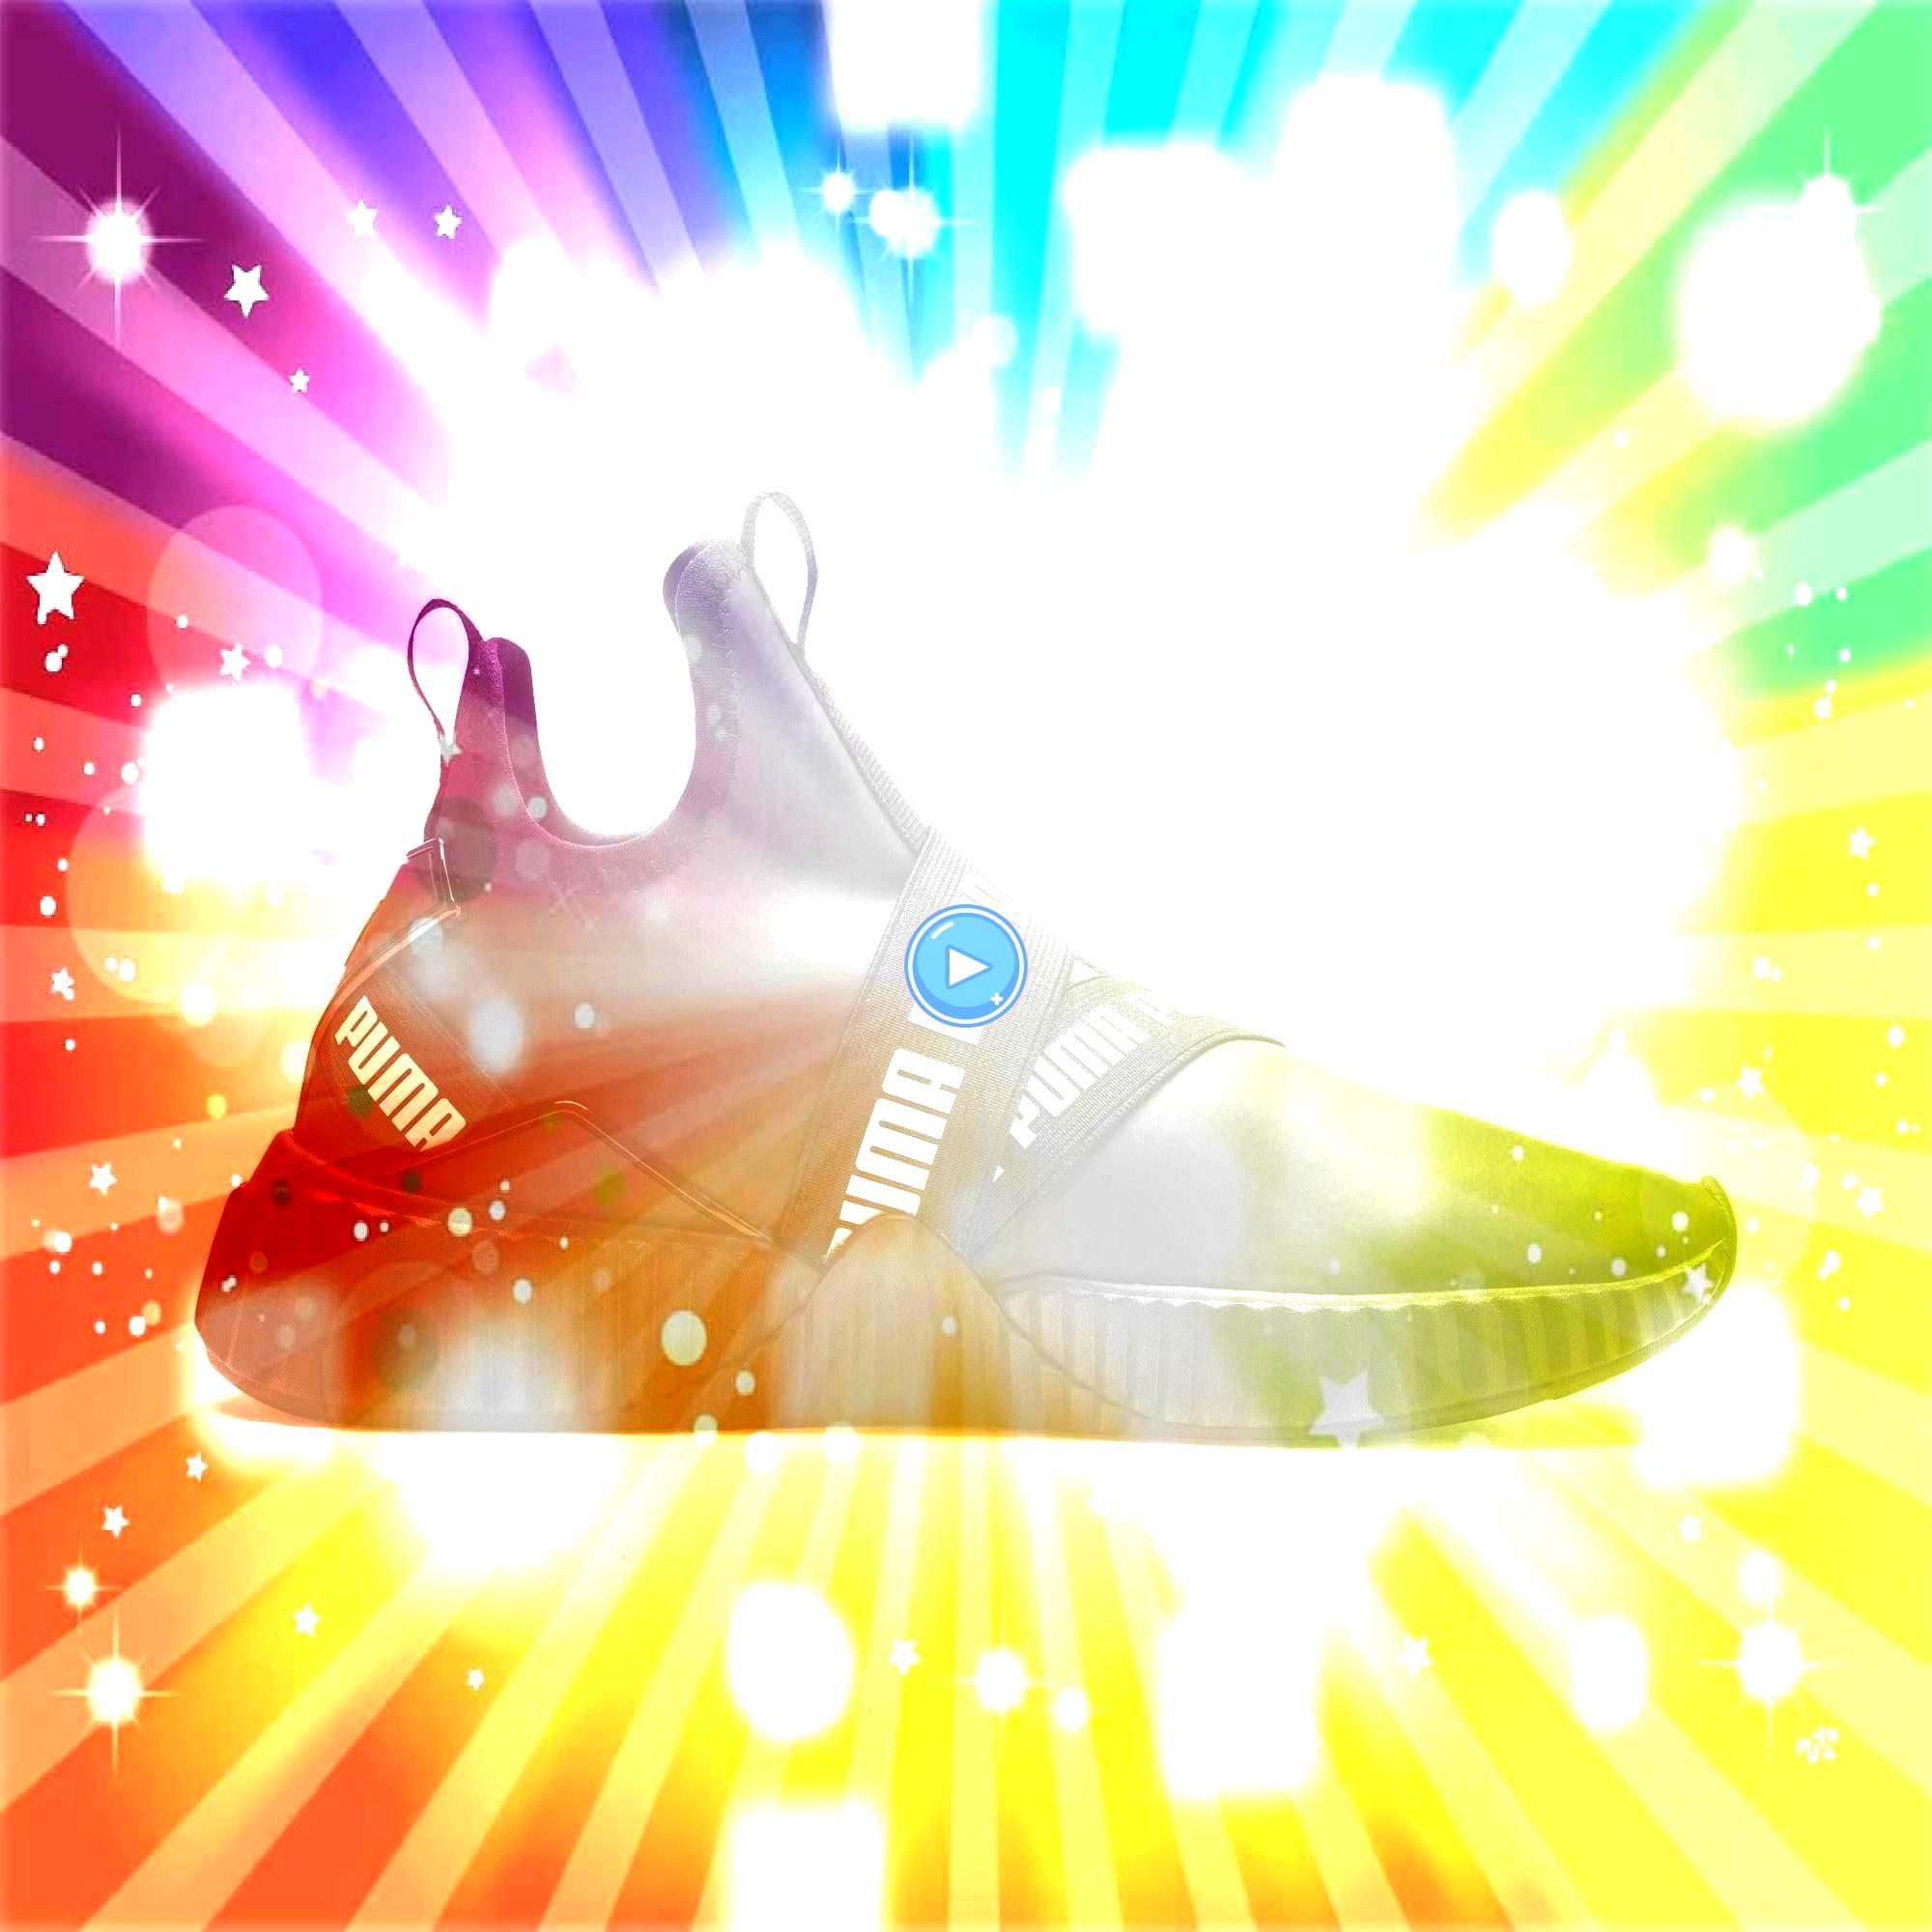 Matte Womens Trainers in BlackWhite size 65 PUMA Defy Mid Matte Damen Sneaker in Schwarz  Weiß Größe 65PUMA Defy Mid Matte Womens Trainers in BlackWhite...